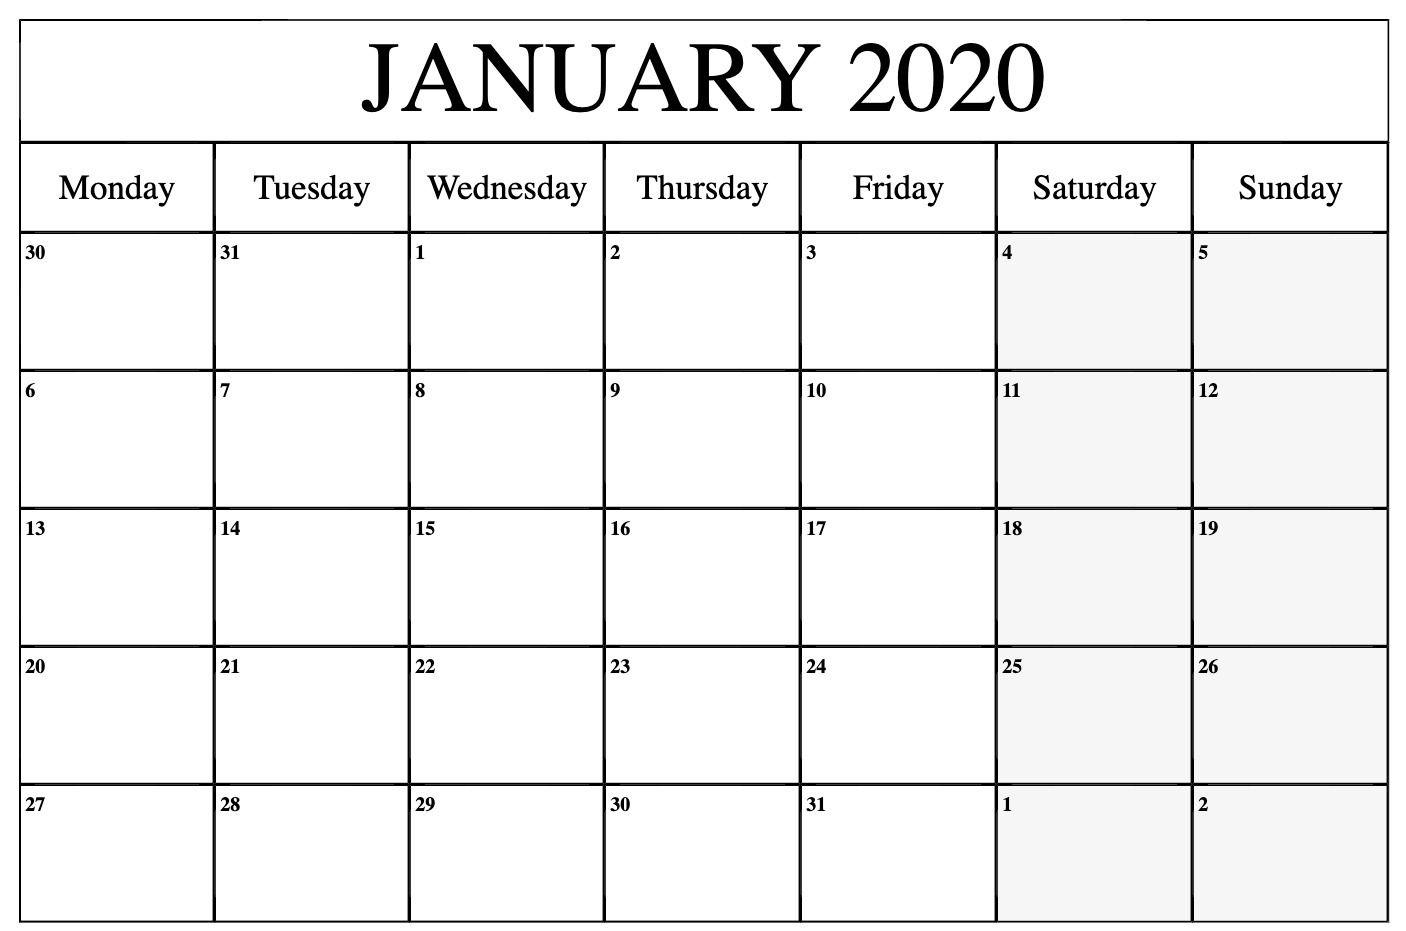 January 2020 Calendar Printable Monday | Free Printable throughout 2020 Monday Through Sunday Calendar Template